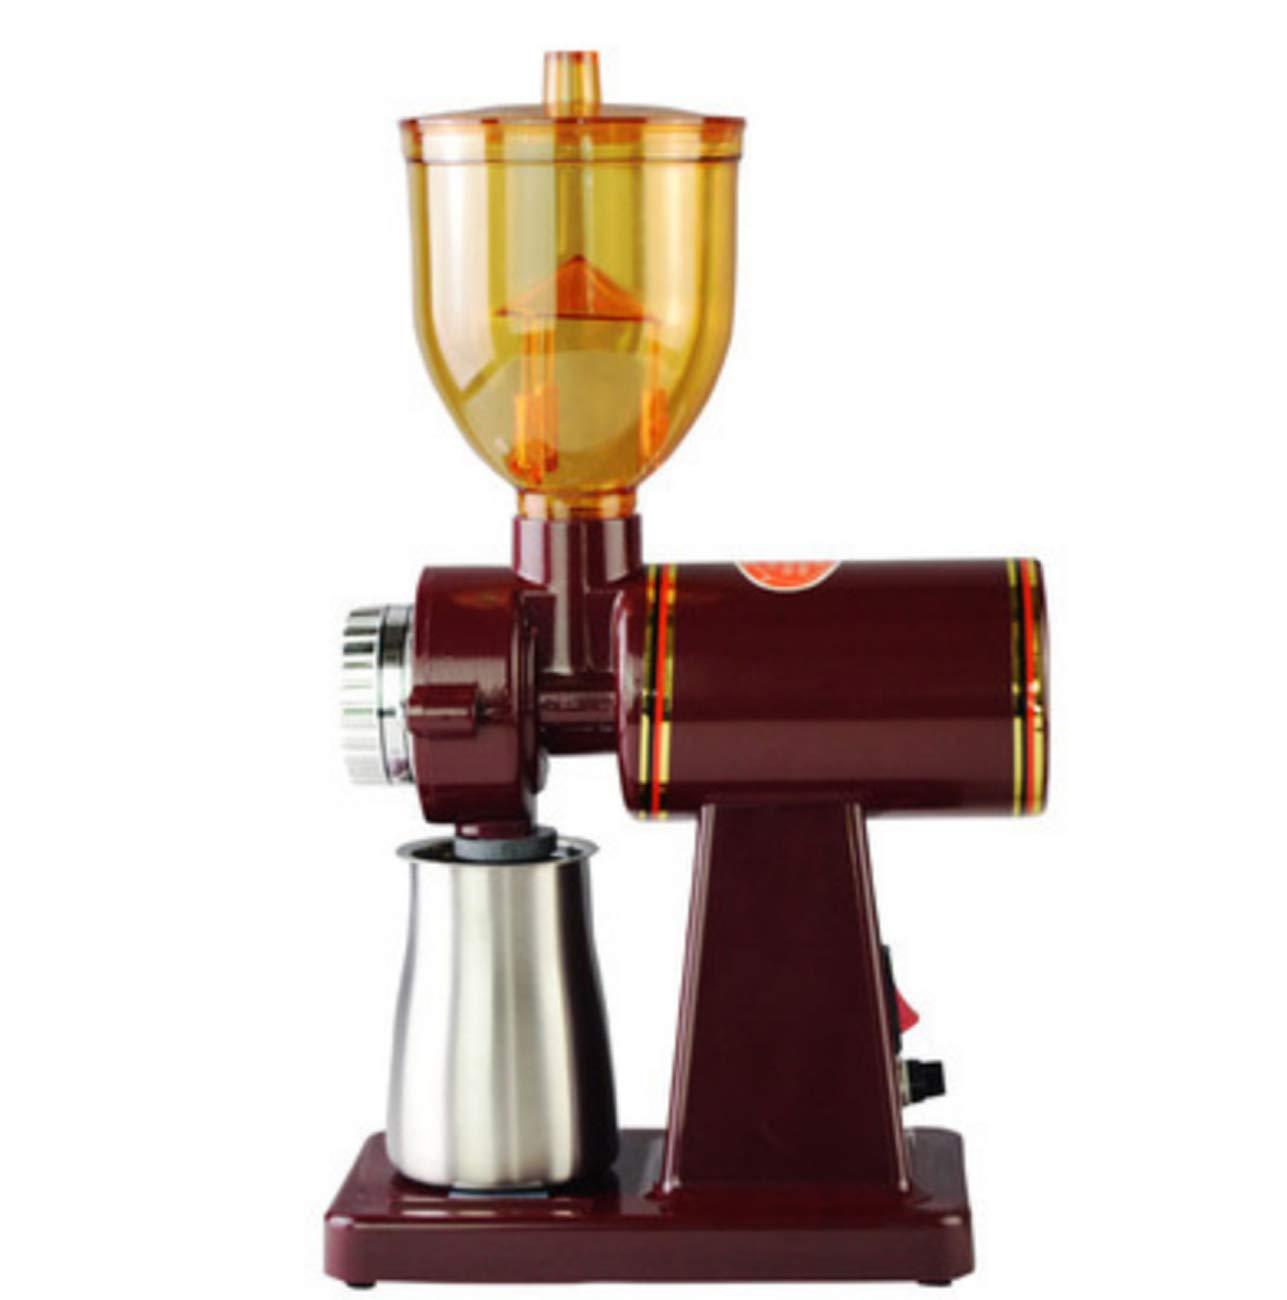 Huaishu Home Kaffee Schleifer Elektro-Kaffeebohnen Schleifer 110V/220V,ROT,220V